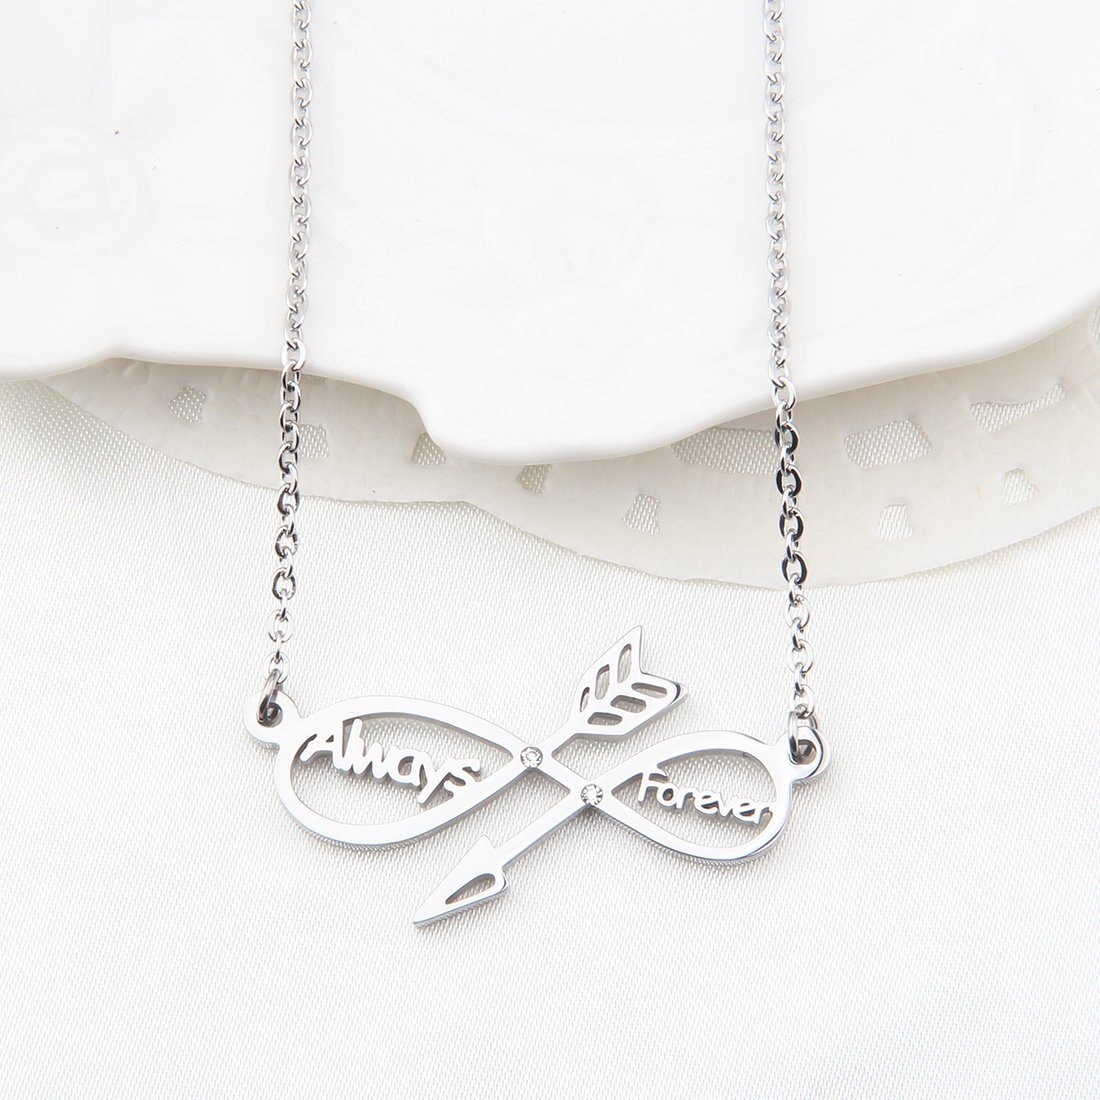 WUSUANED Infinity Necklace- Sideways Arrow Necklace Always ...